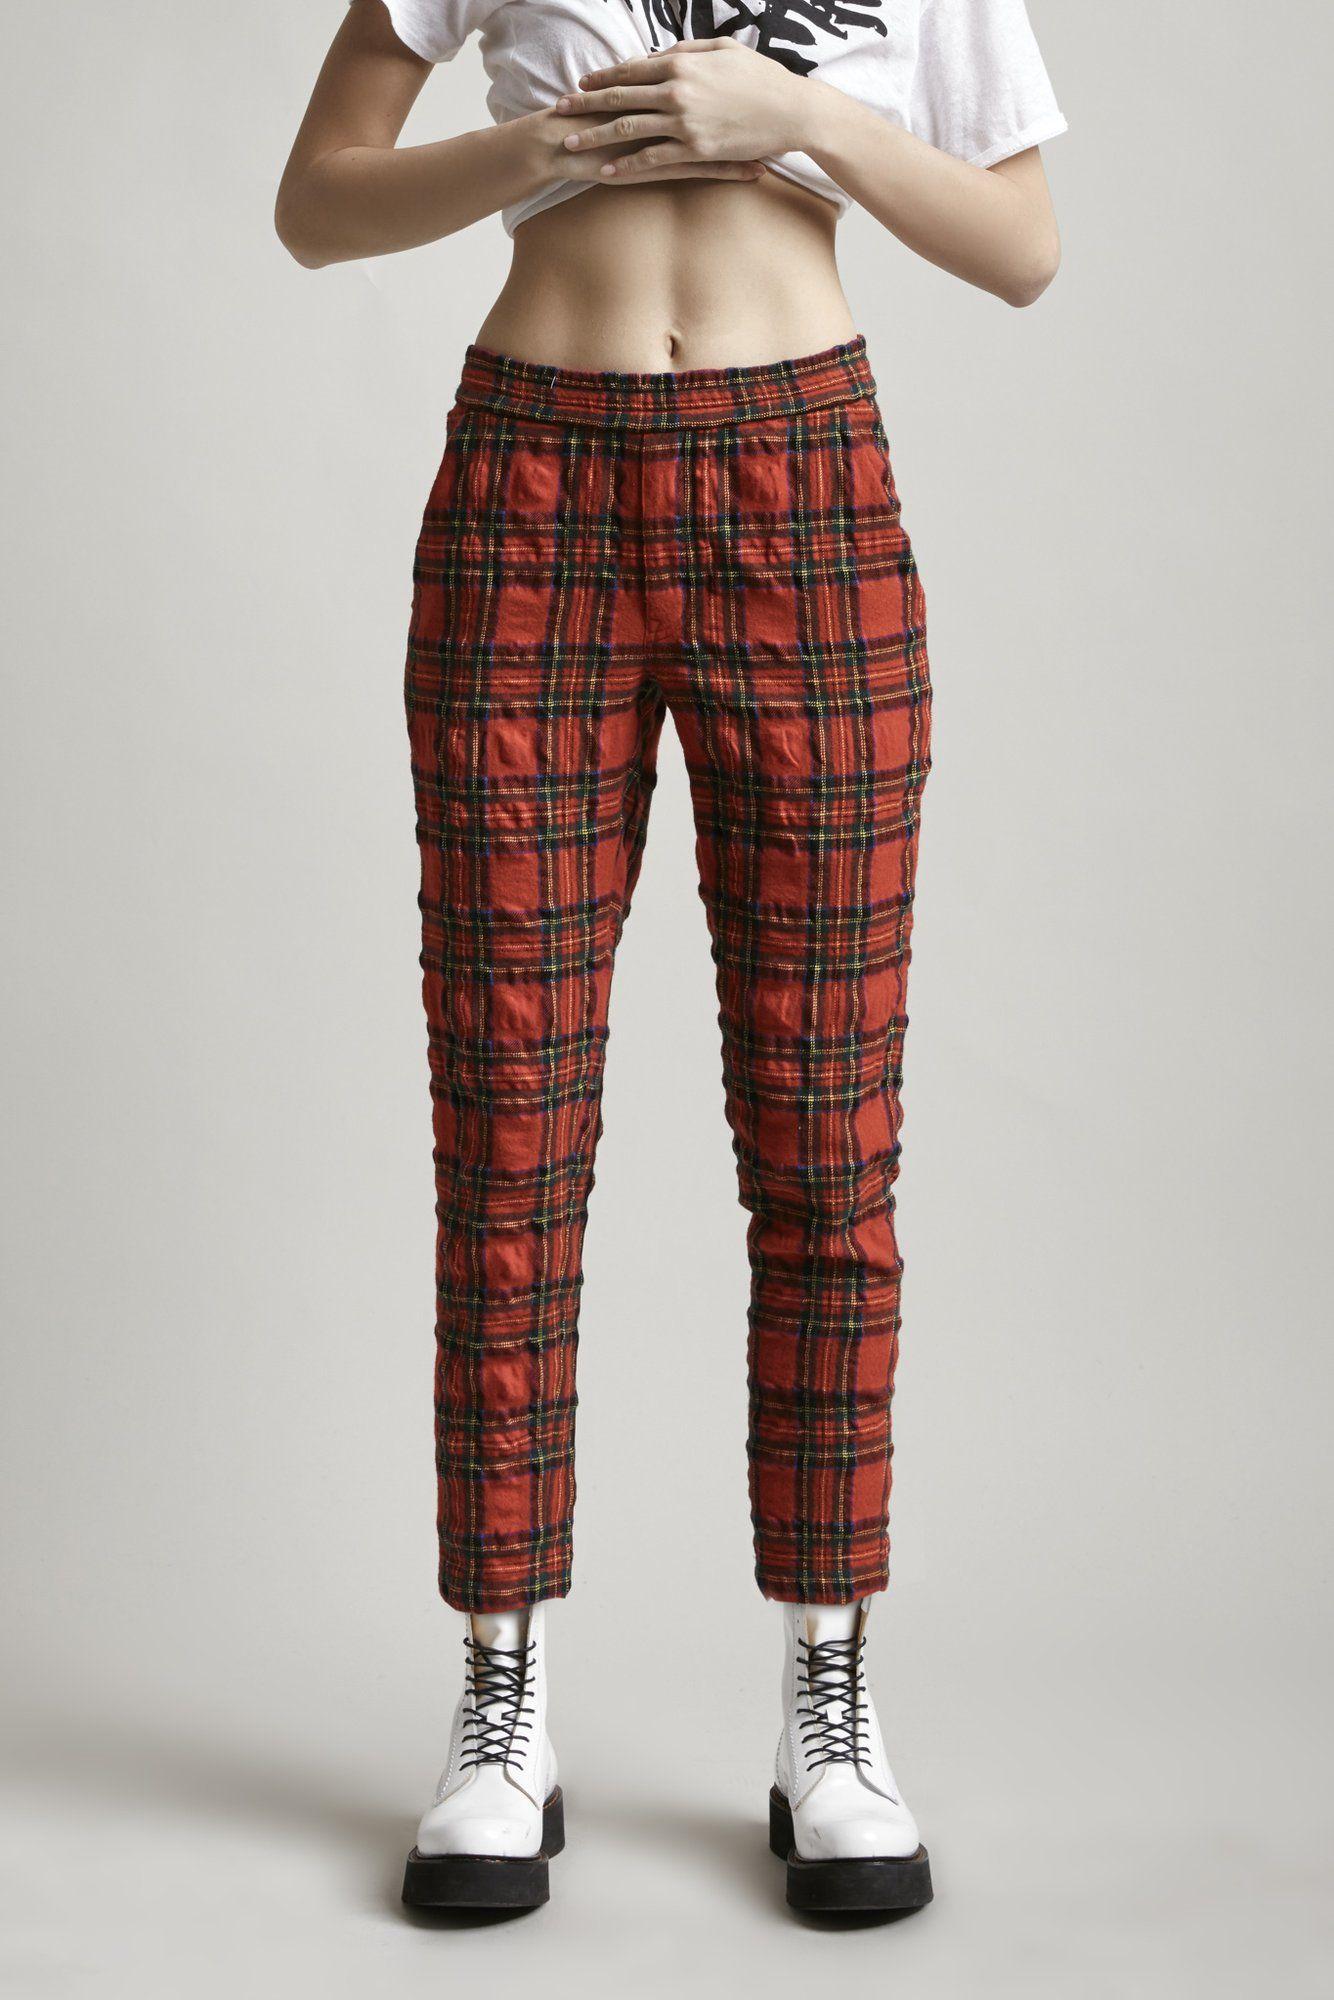 740a296e490 PJ Pant - Red Tartan Red Plaid Pants